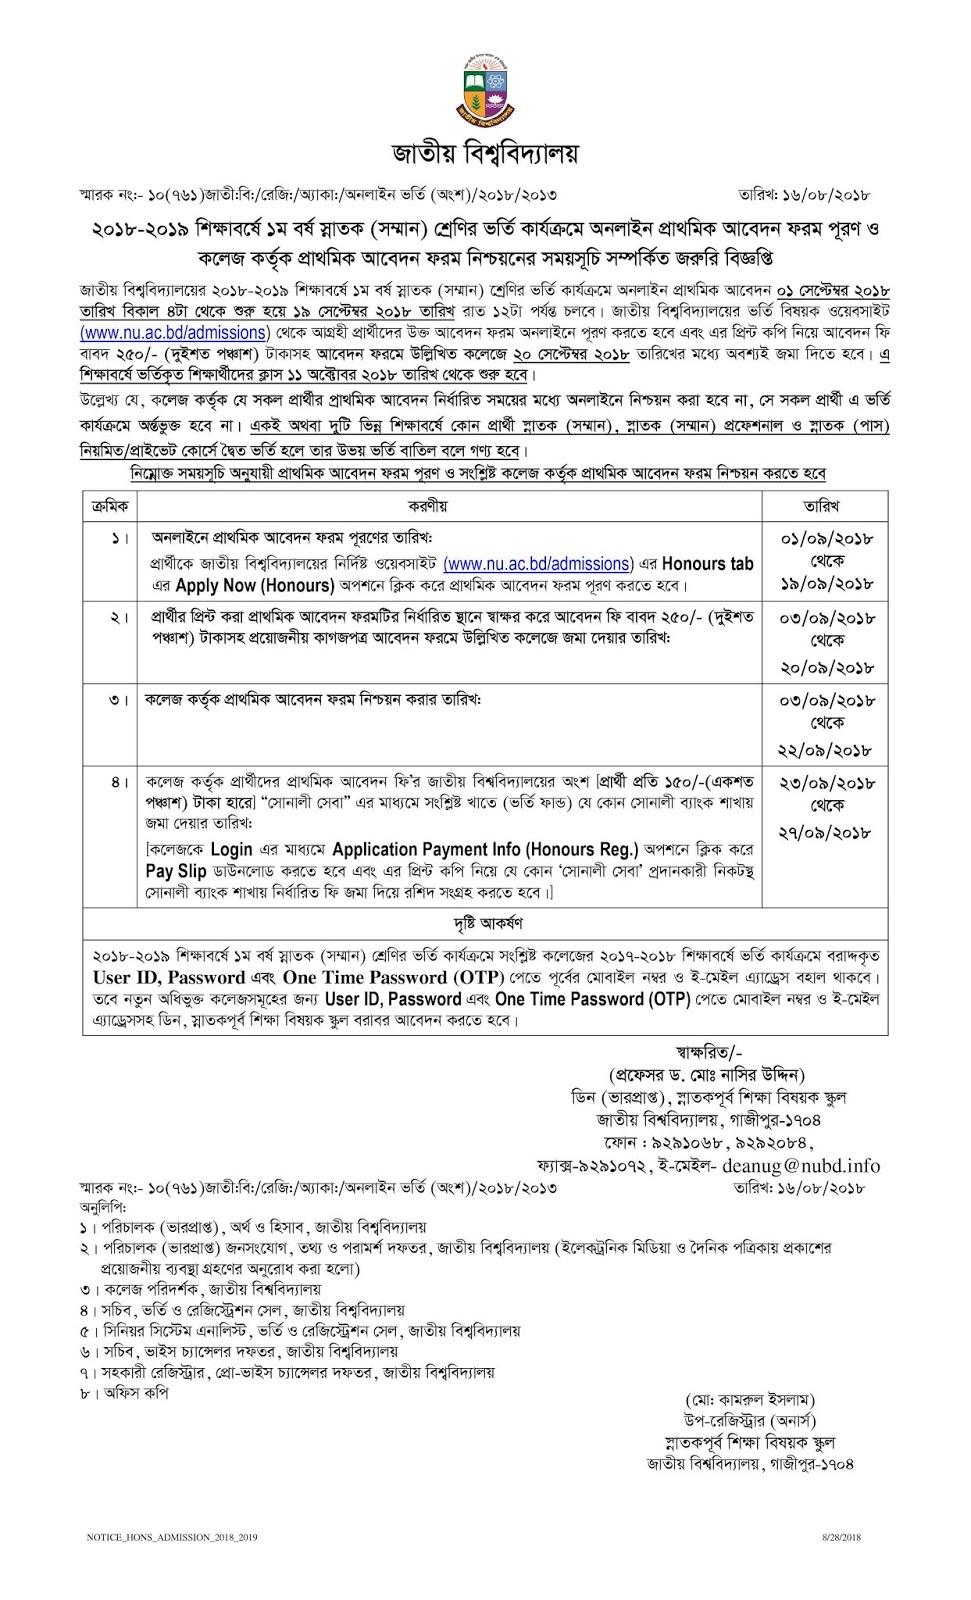 National University Honors admission Circular 2018-19